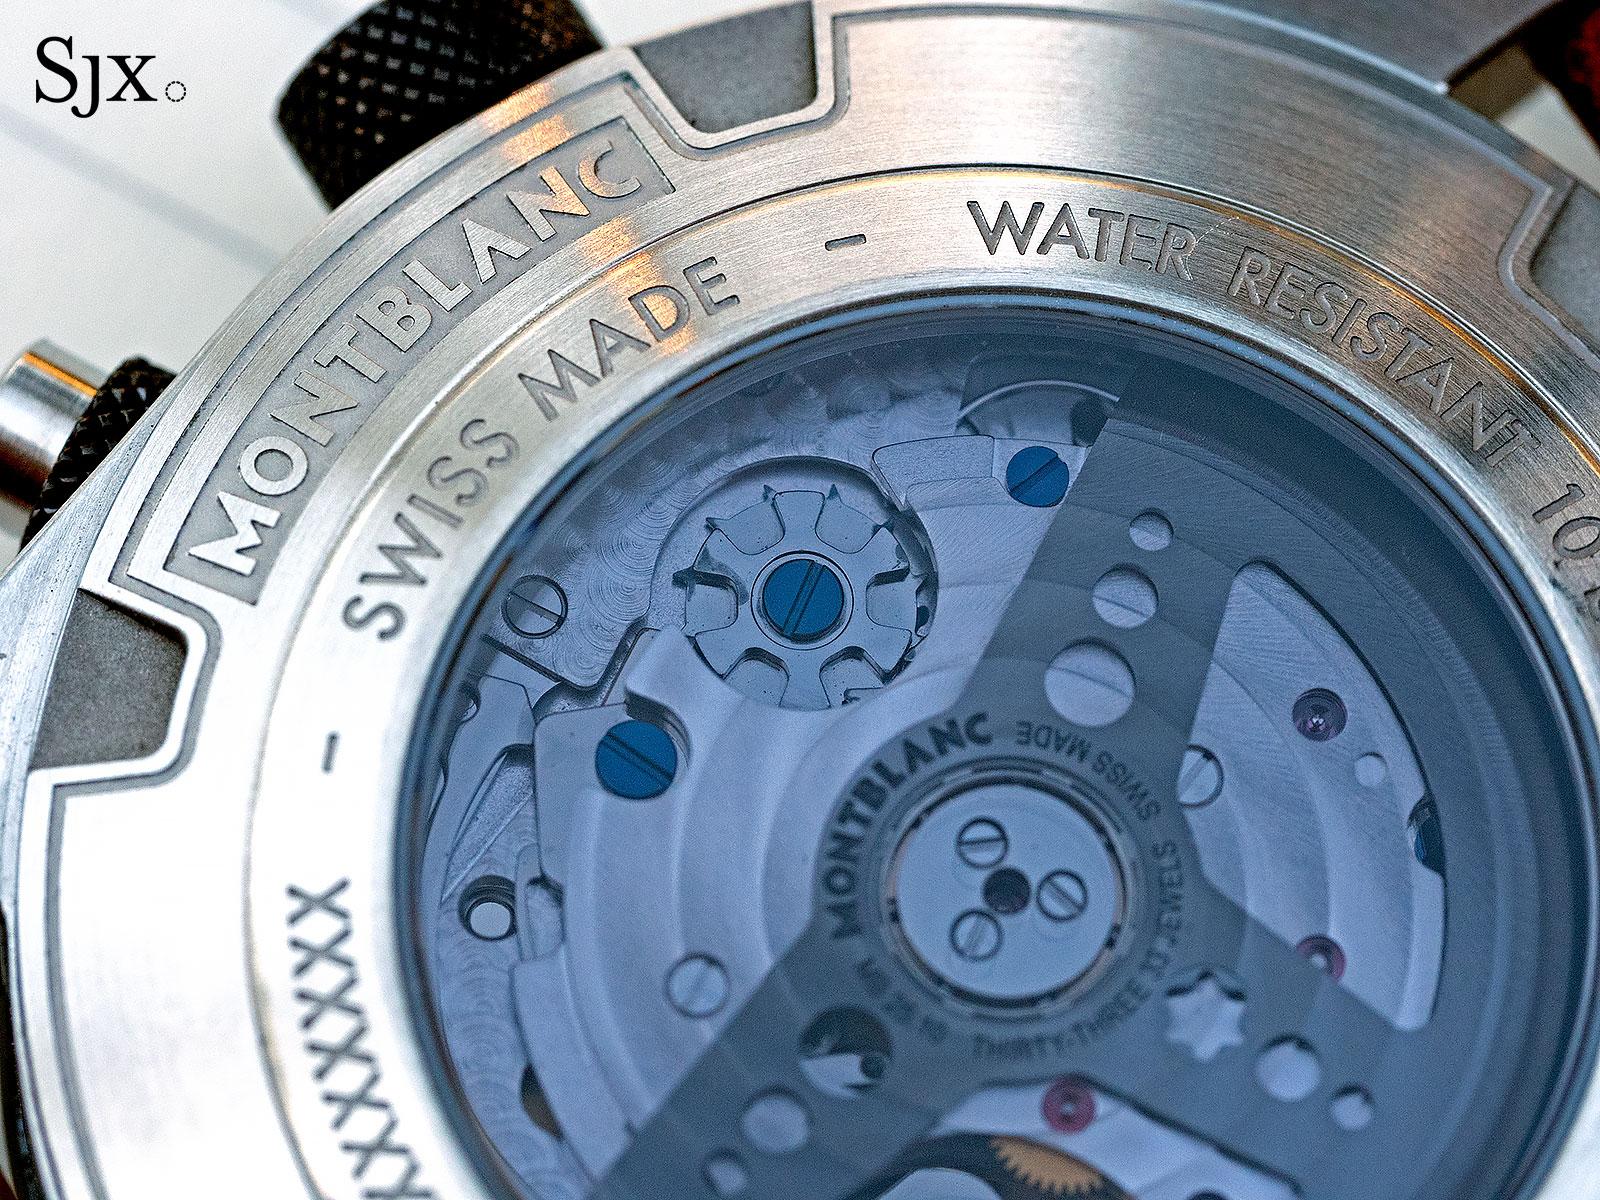 Montblanc Montblanc TimeWalker Manufacture Chronograph 9